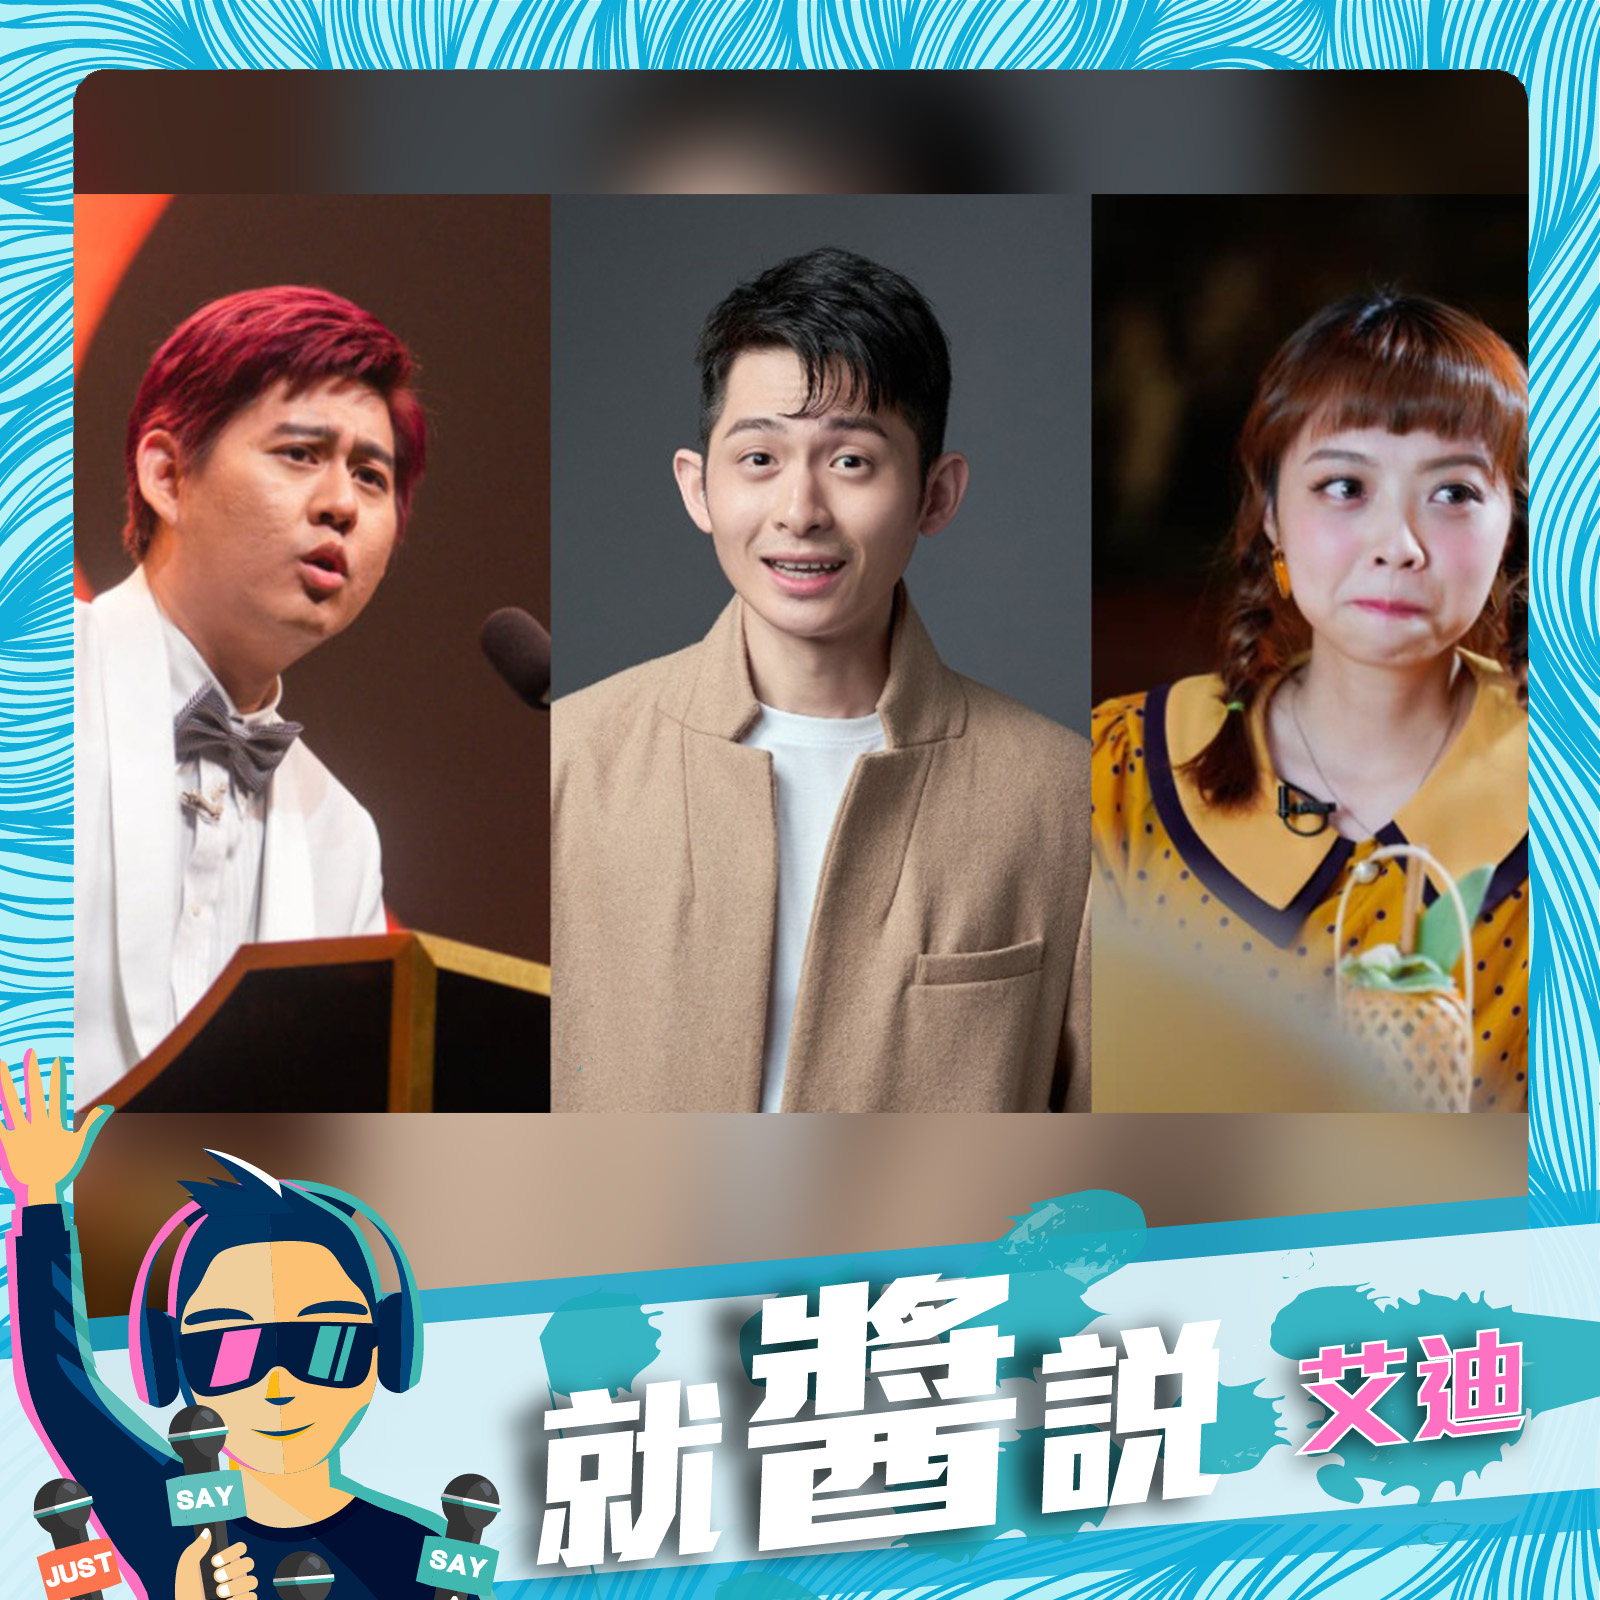 EP.245|脫口秀演員龍龍、老K、博恩事件懶人秒懂包 【Talk show / 炎上 BURN】